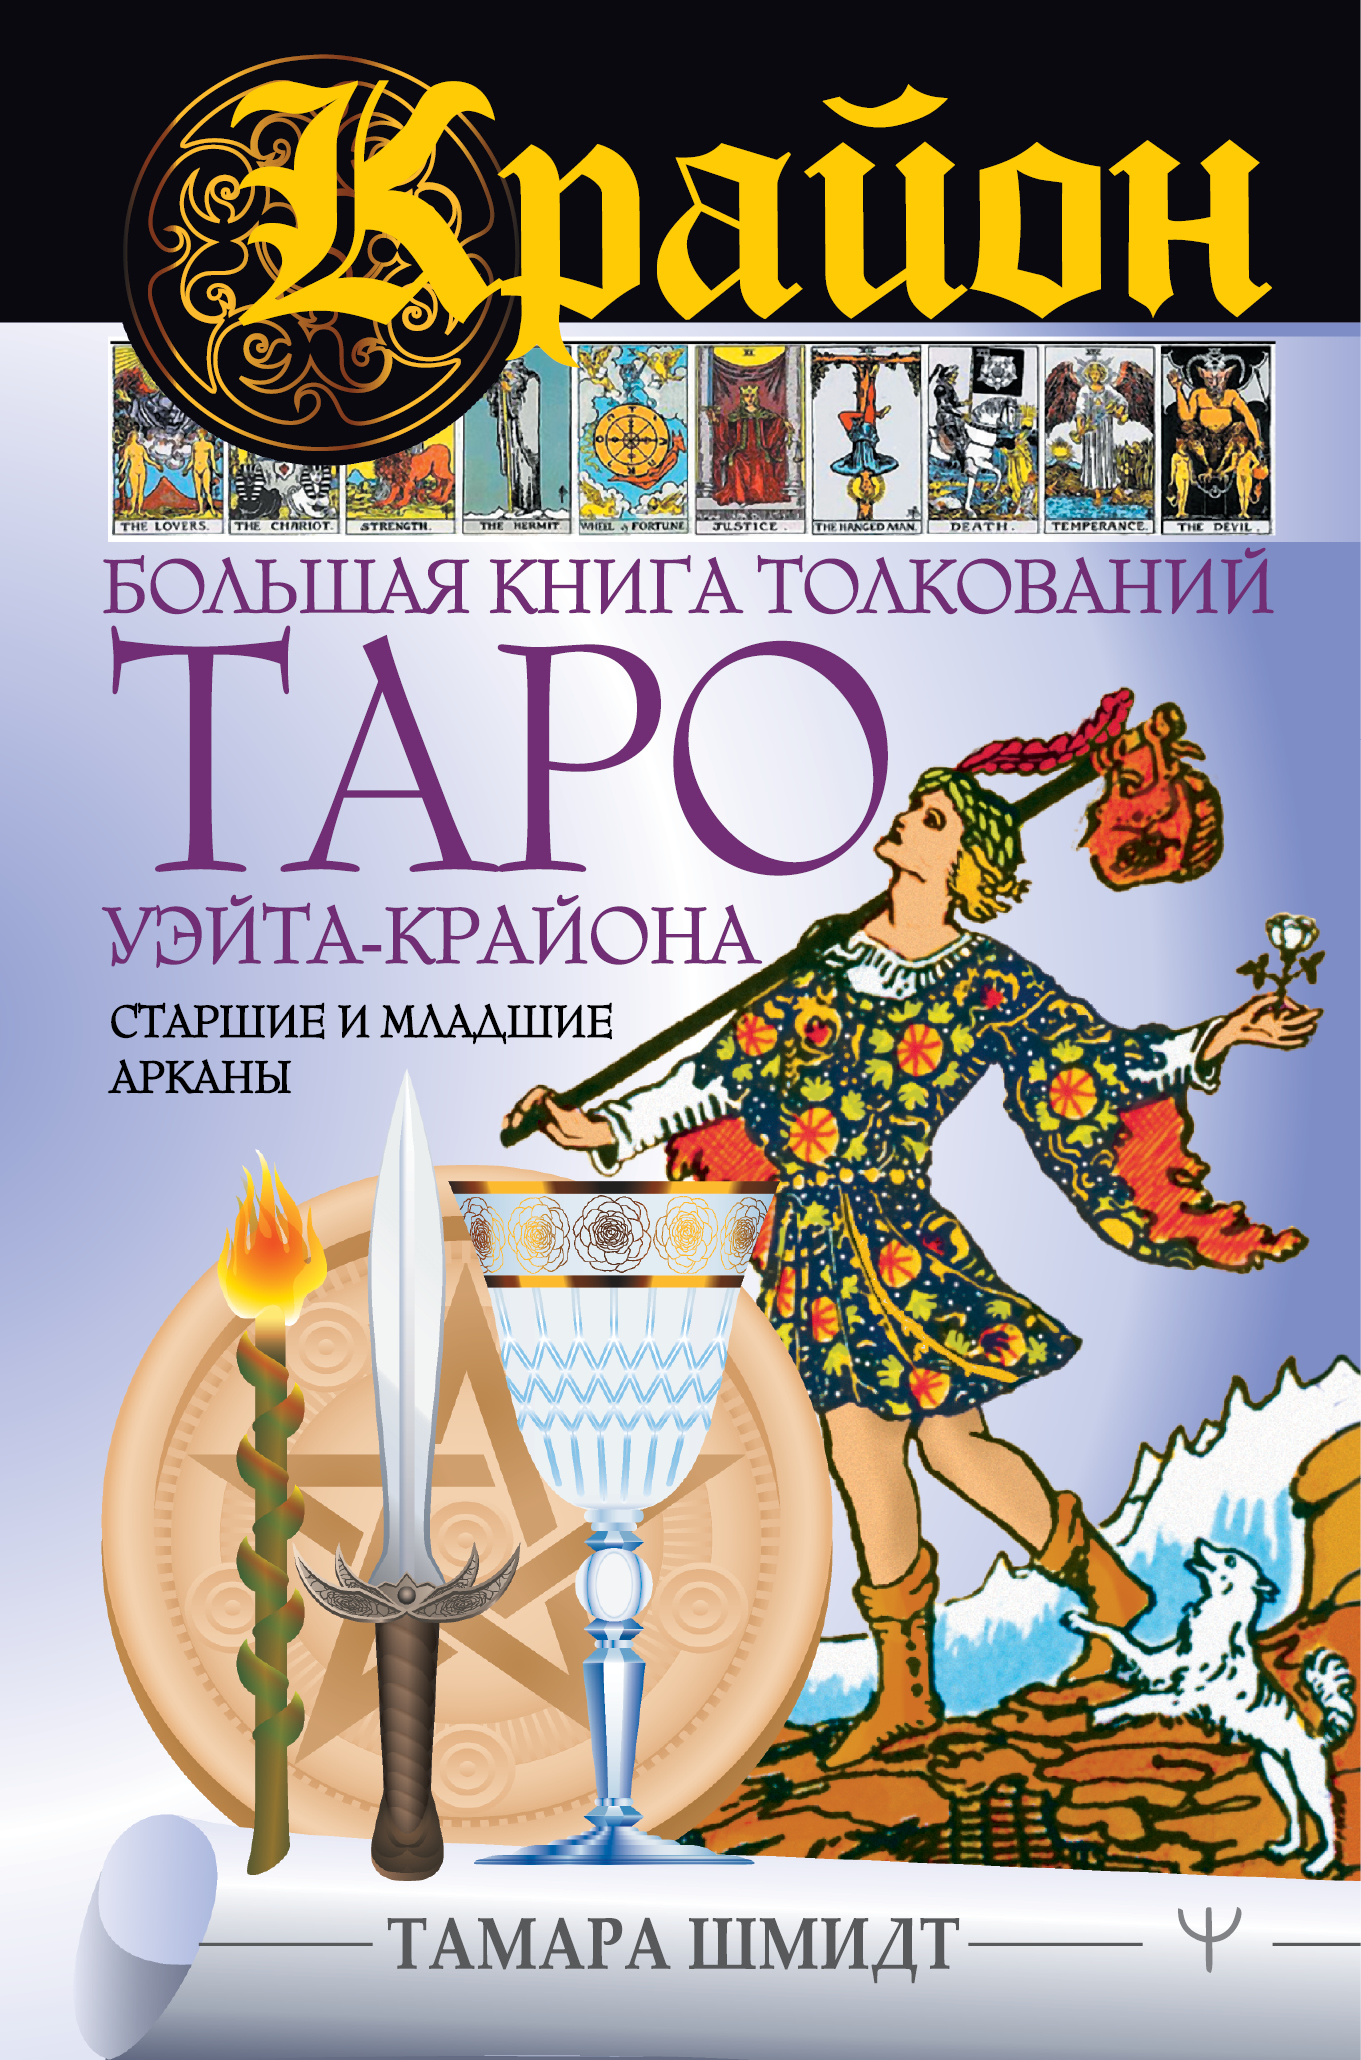 Тамара Шмидт «Крайон. Большая книга толкований Таро Уэйта-Крайона. Старшие и младшие арканы»